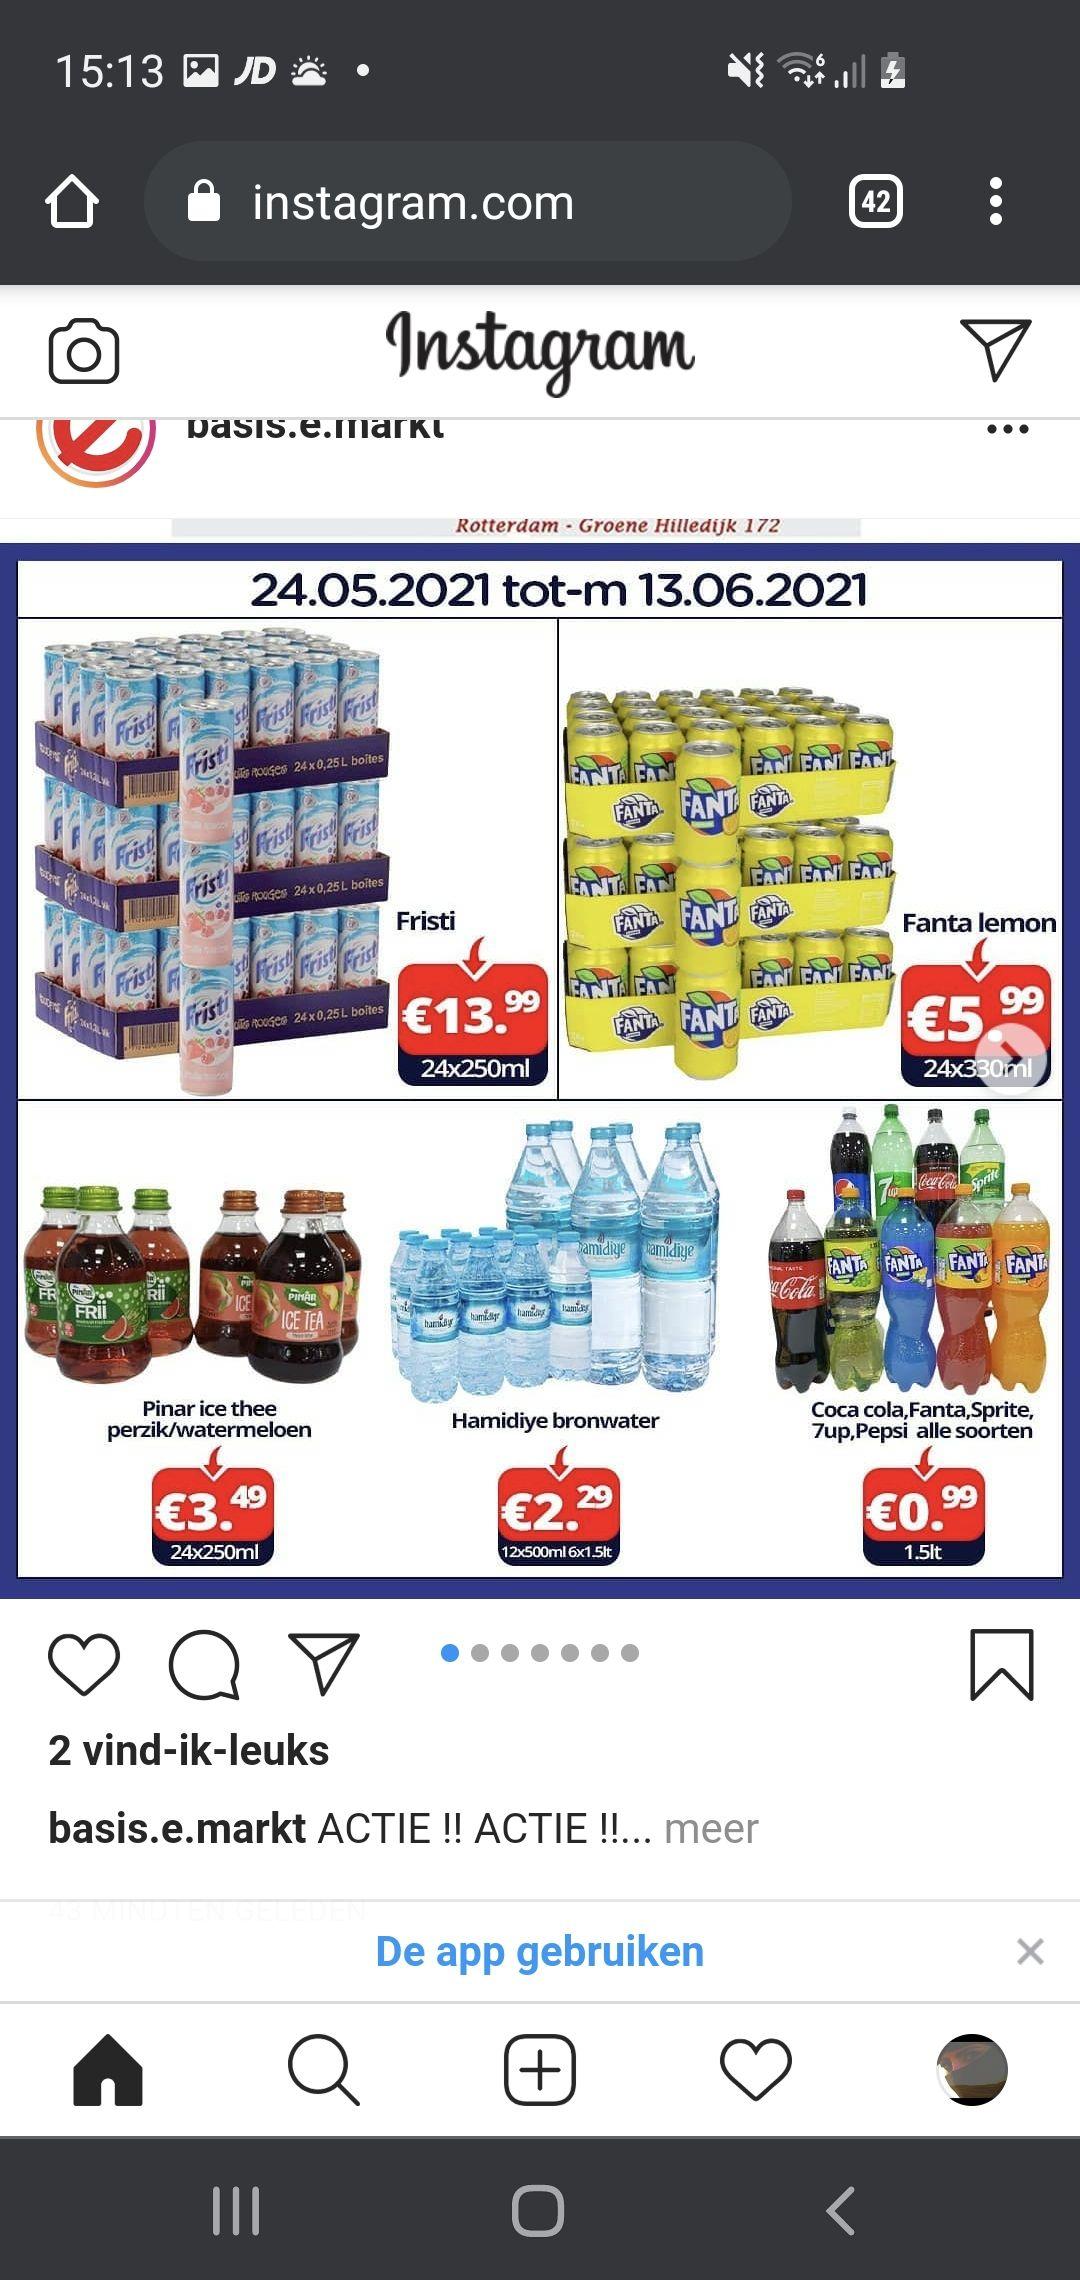 Lokaal Rotterdam Basis e markt 24×330ml Fanta 5.99 en watermeloen/perzik drank 24×250ml € 3.49